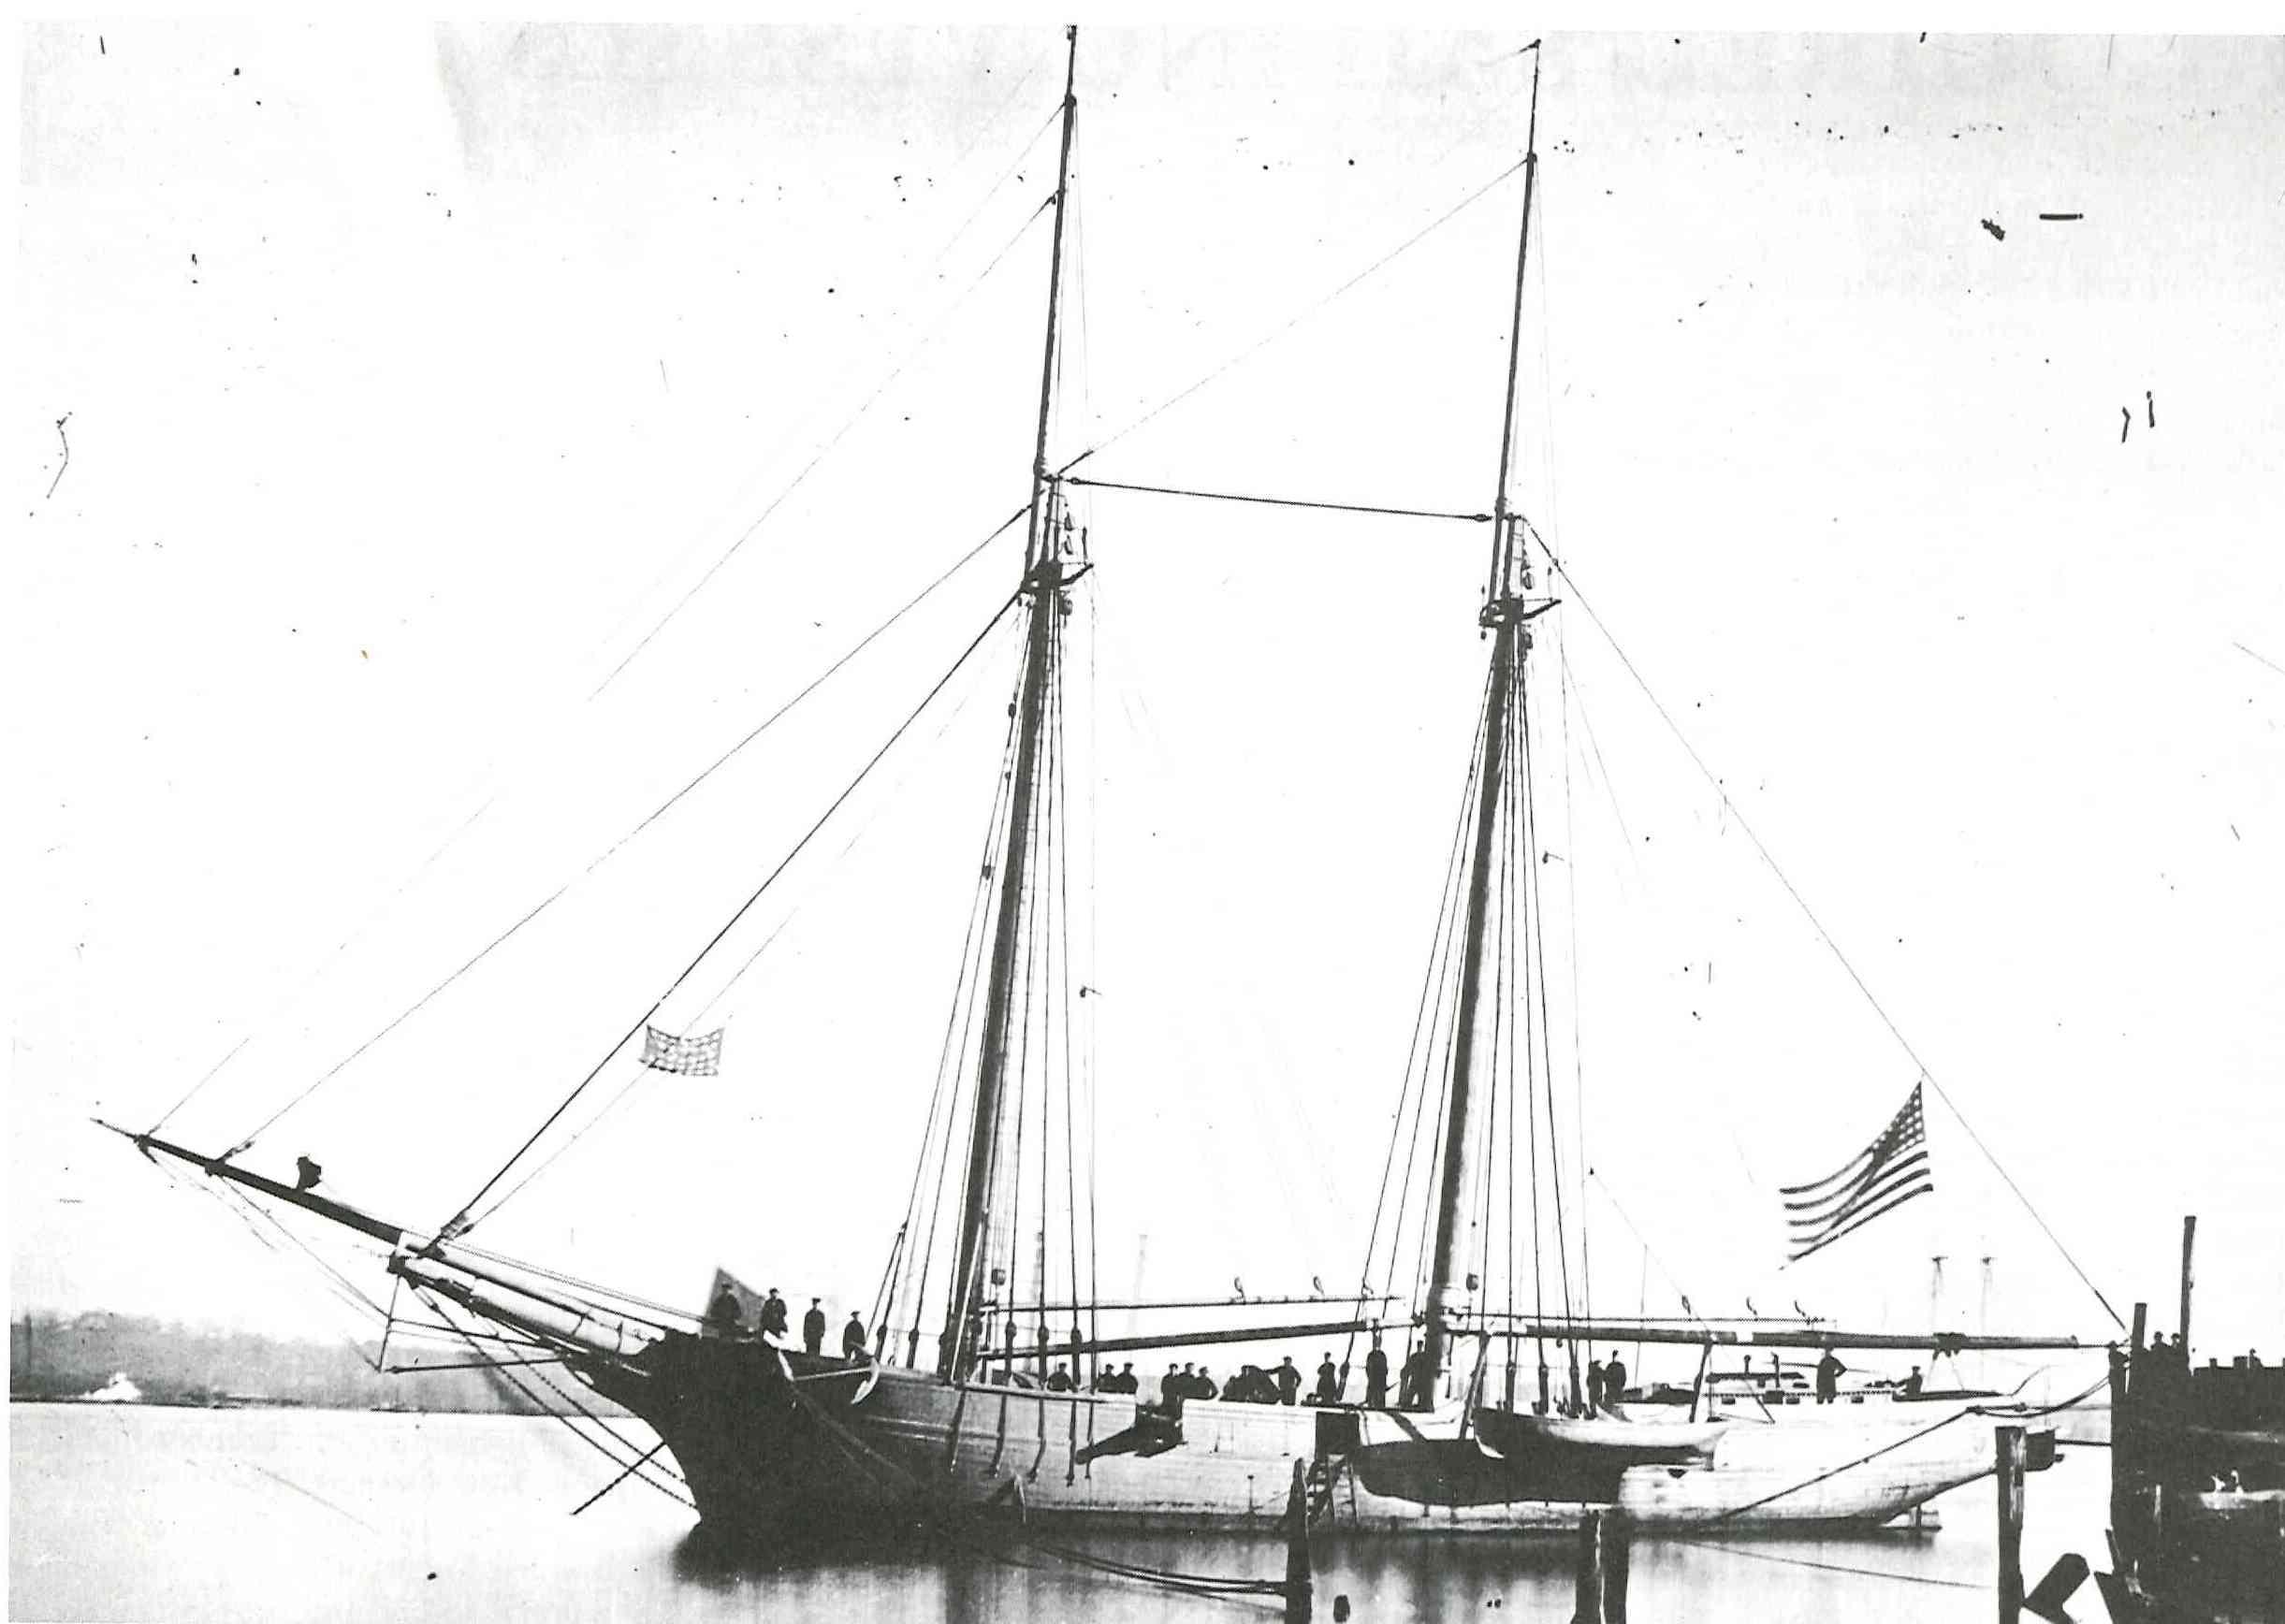 Mortars On Ships : Civil war navy sesquicentennial porter s mortar schooners